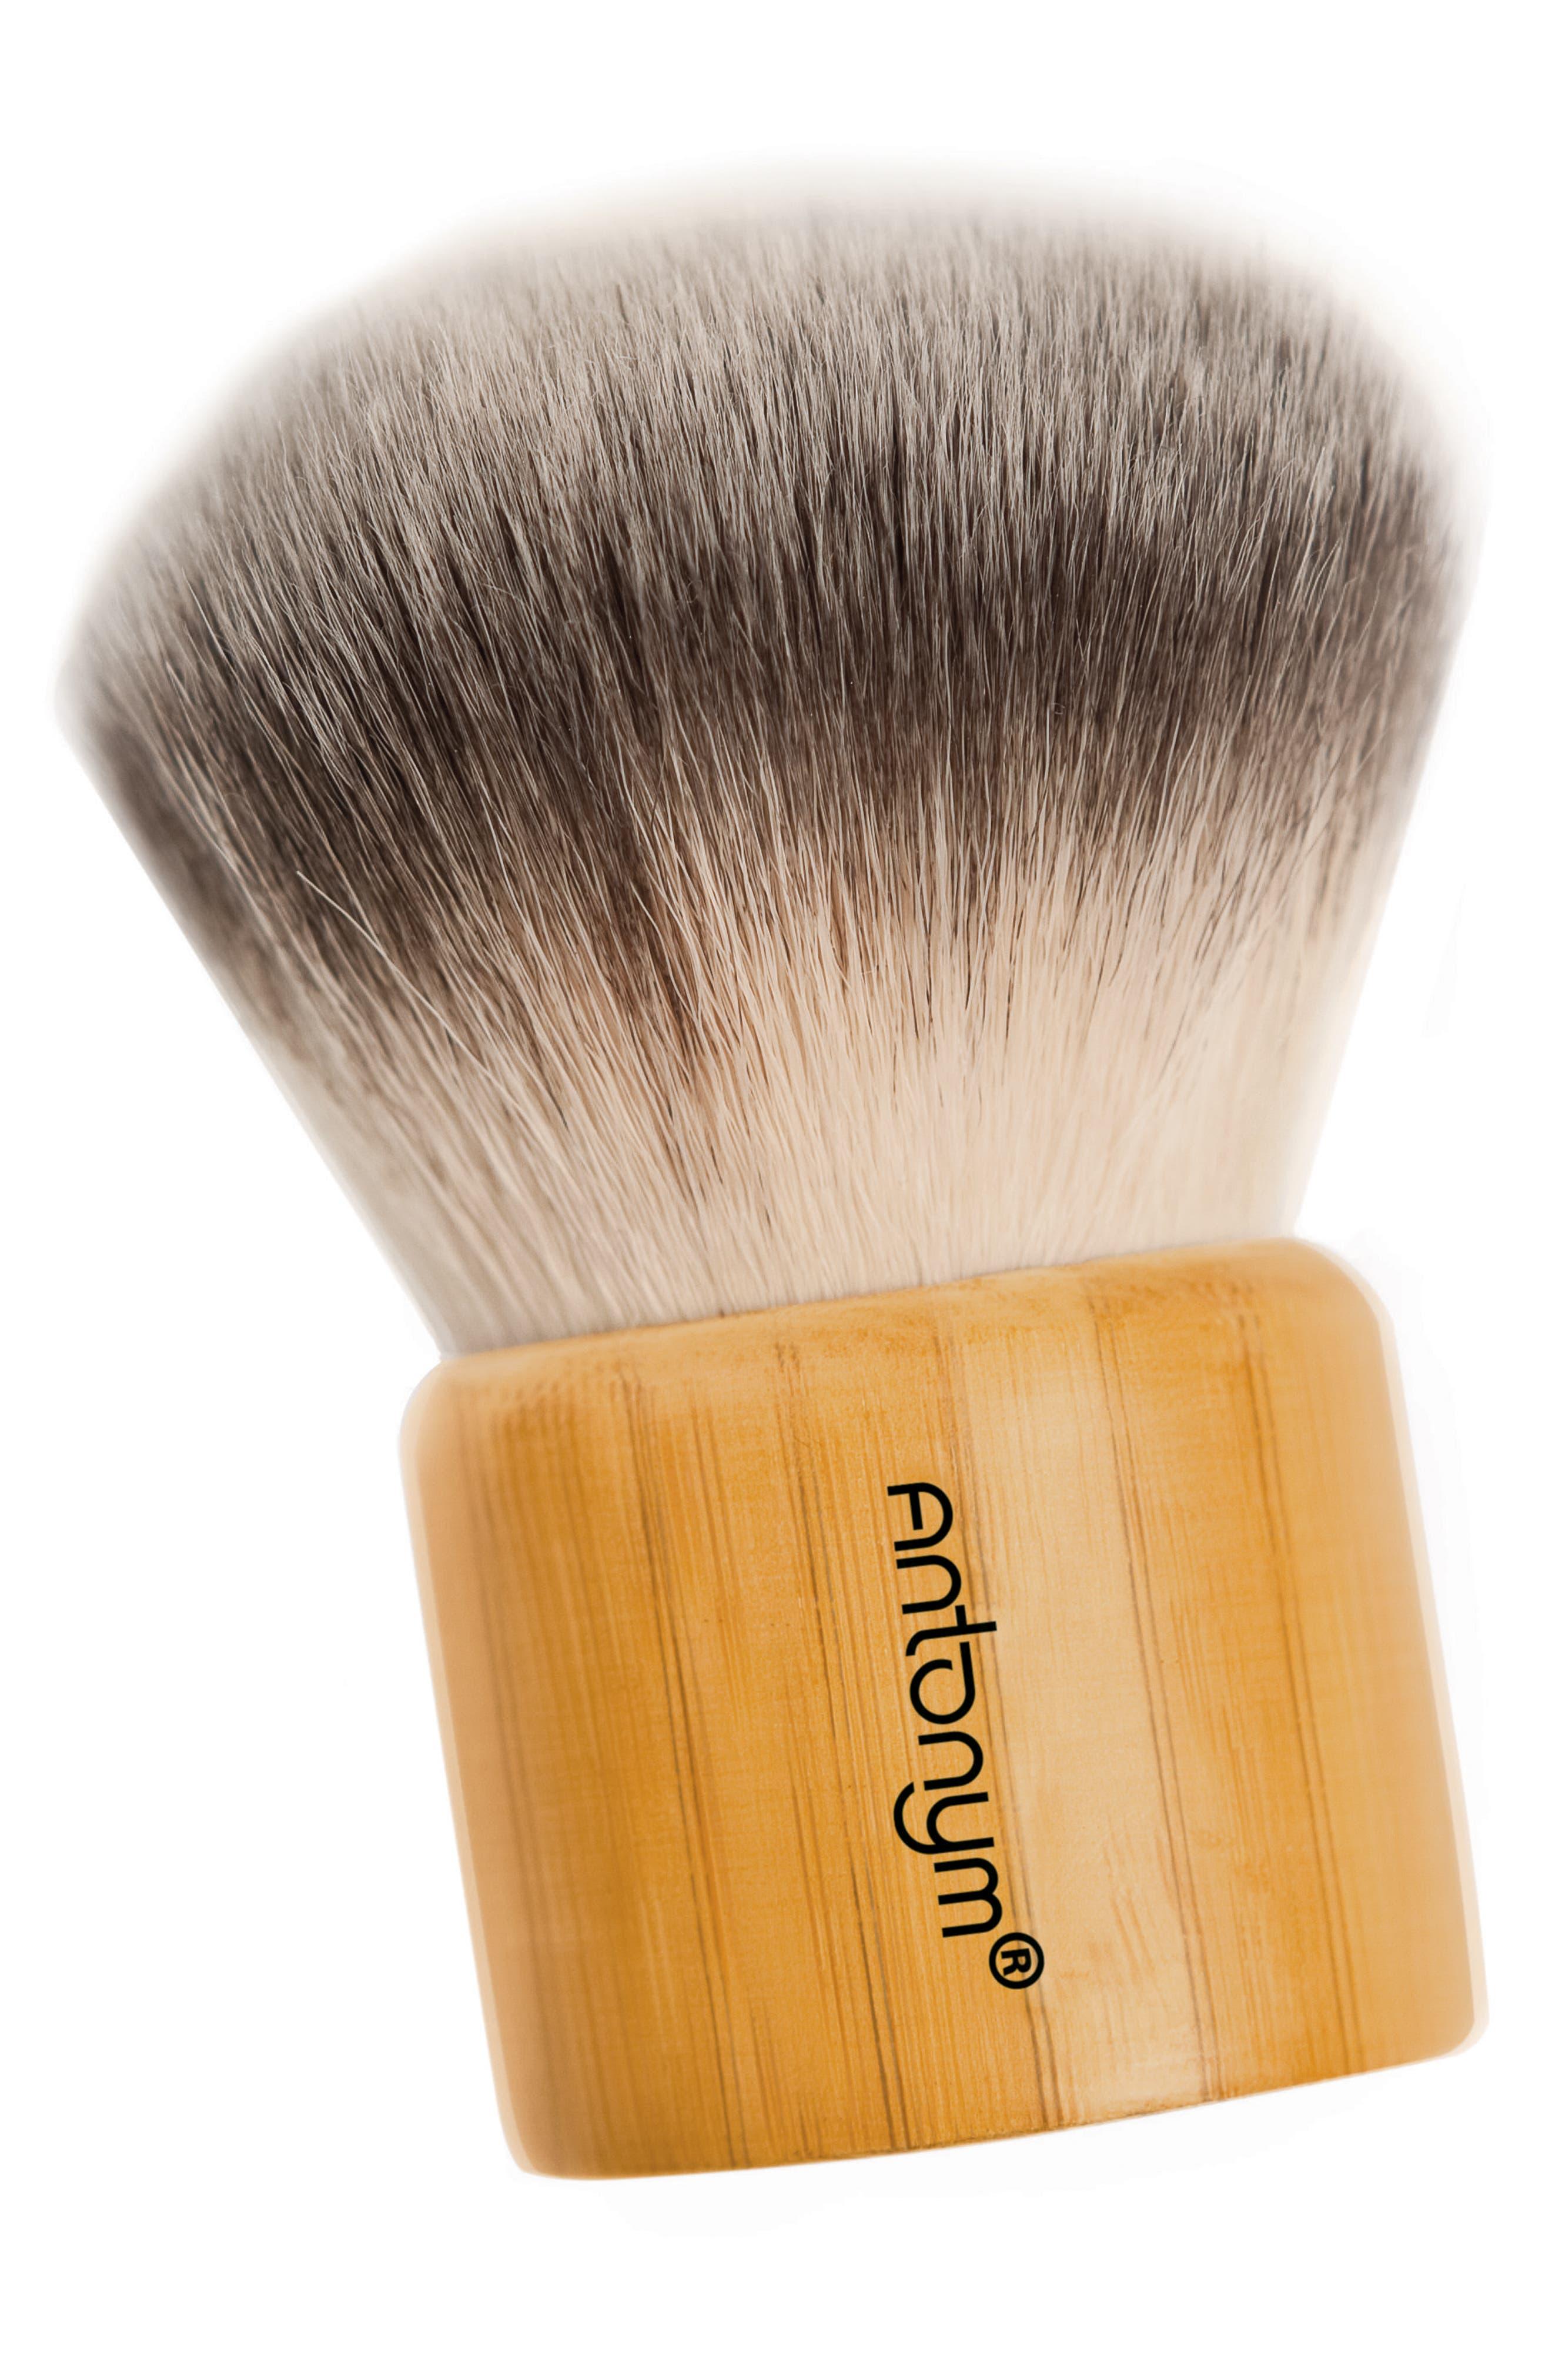 Kabuki Brush & Pouch,                             Main thumbnail 1, color,                             NO COLOR